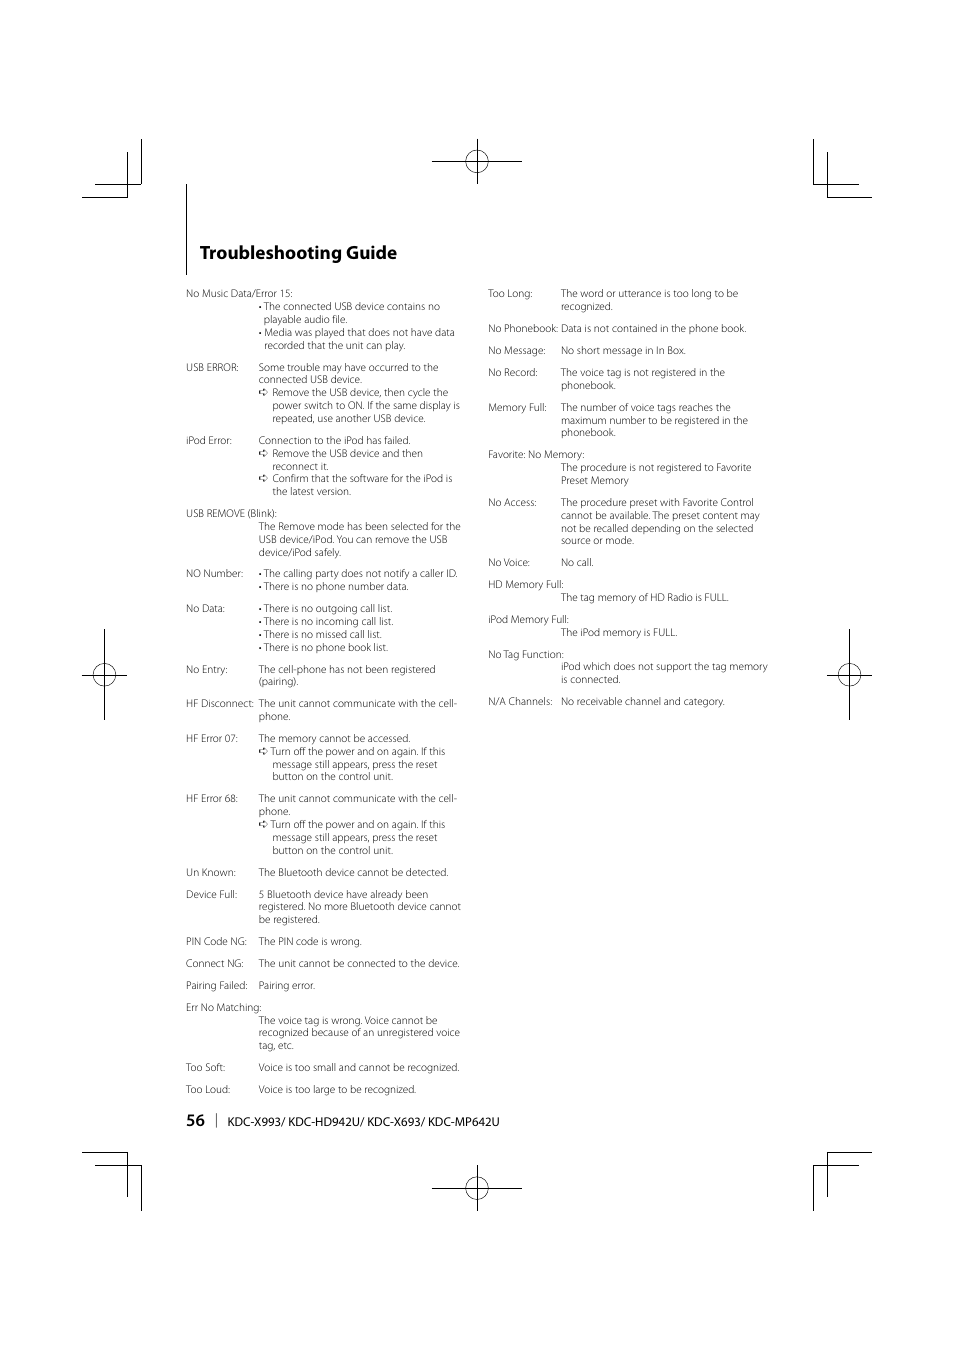 Troubleshooting guide | Kenwood KDC-MP642U User Manual